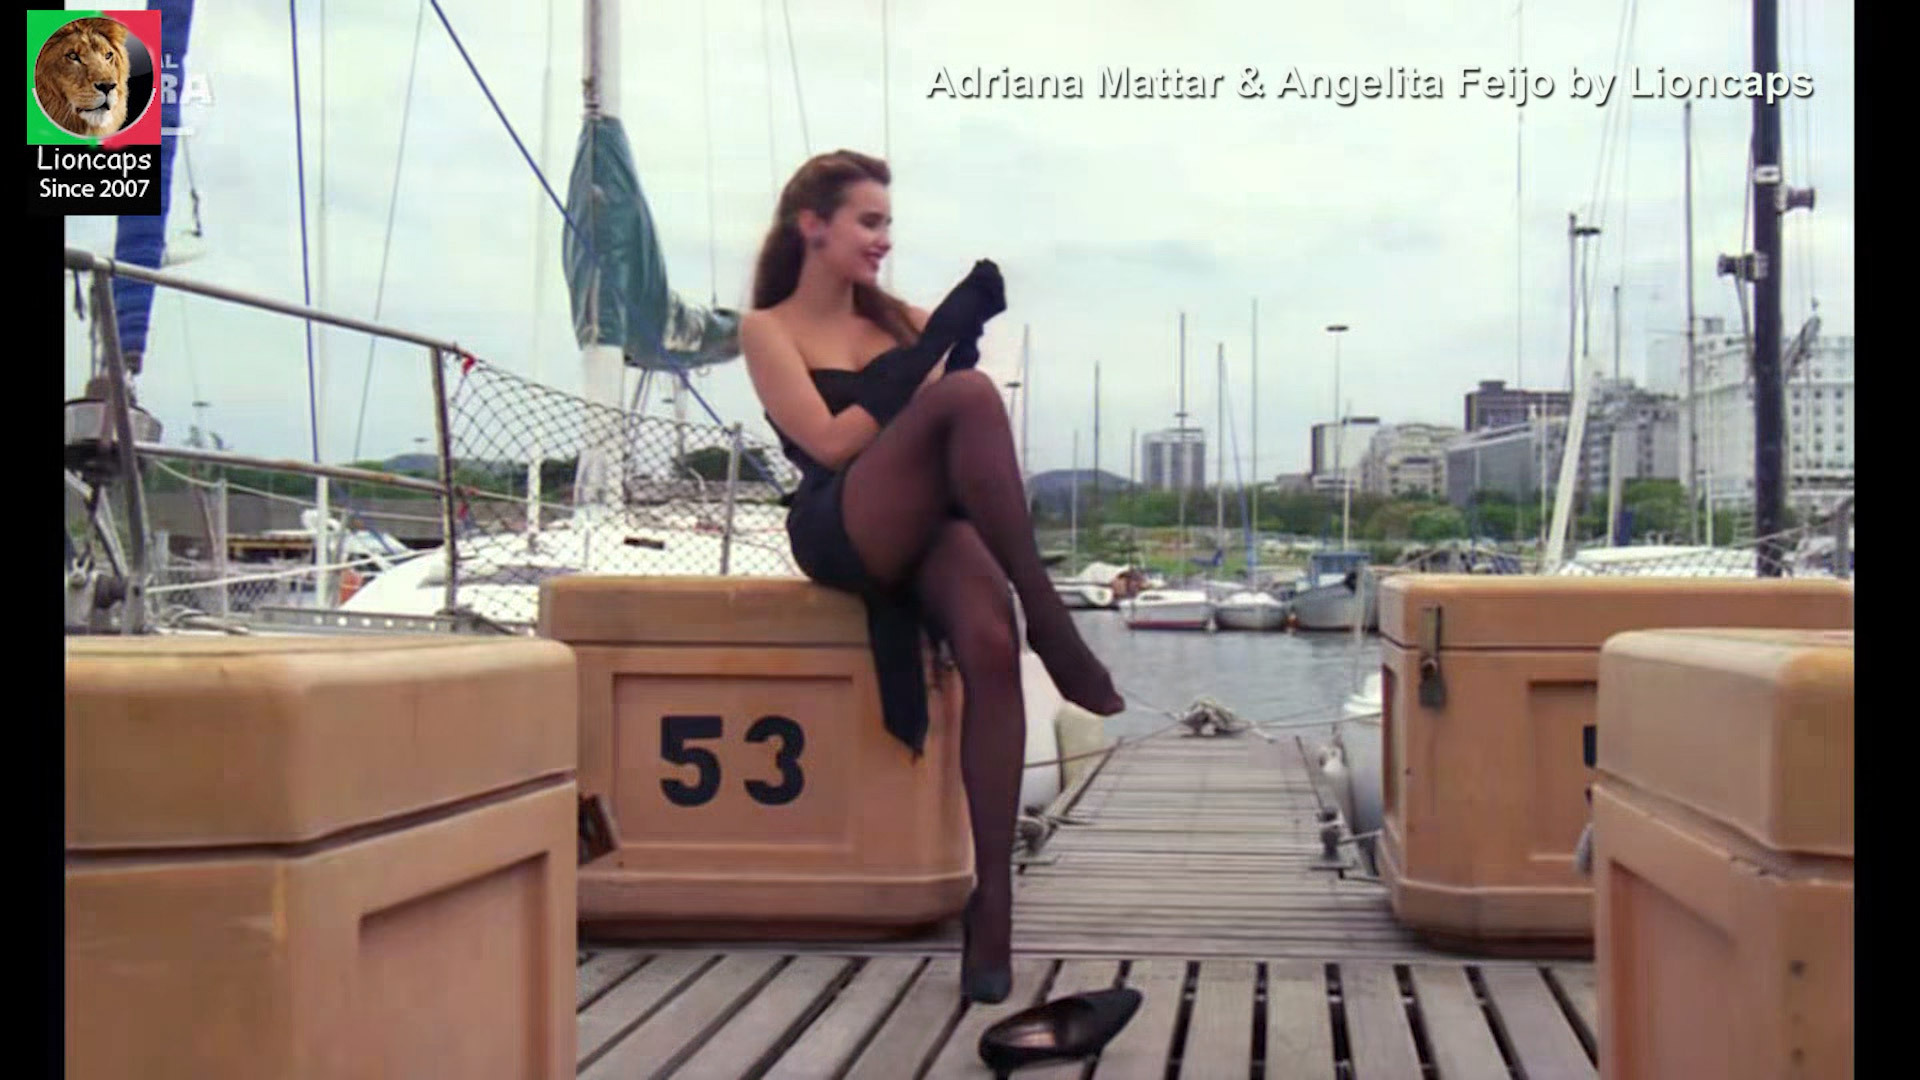 adriana_mattar_angelita_feijo_matou_familia_lioncaps_29_11_2020_1b (6).jpg